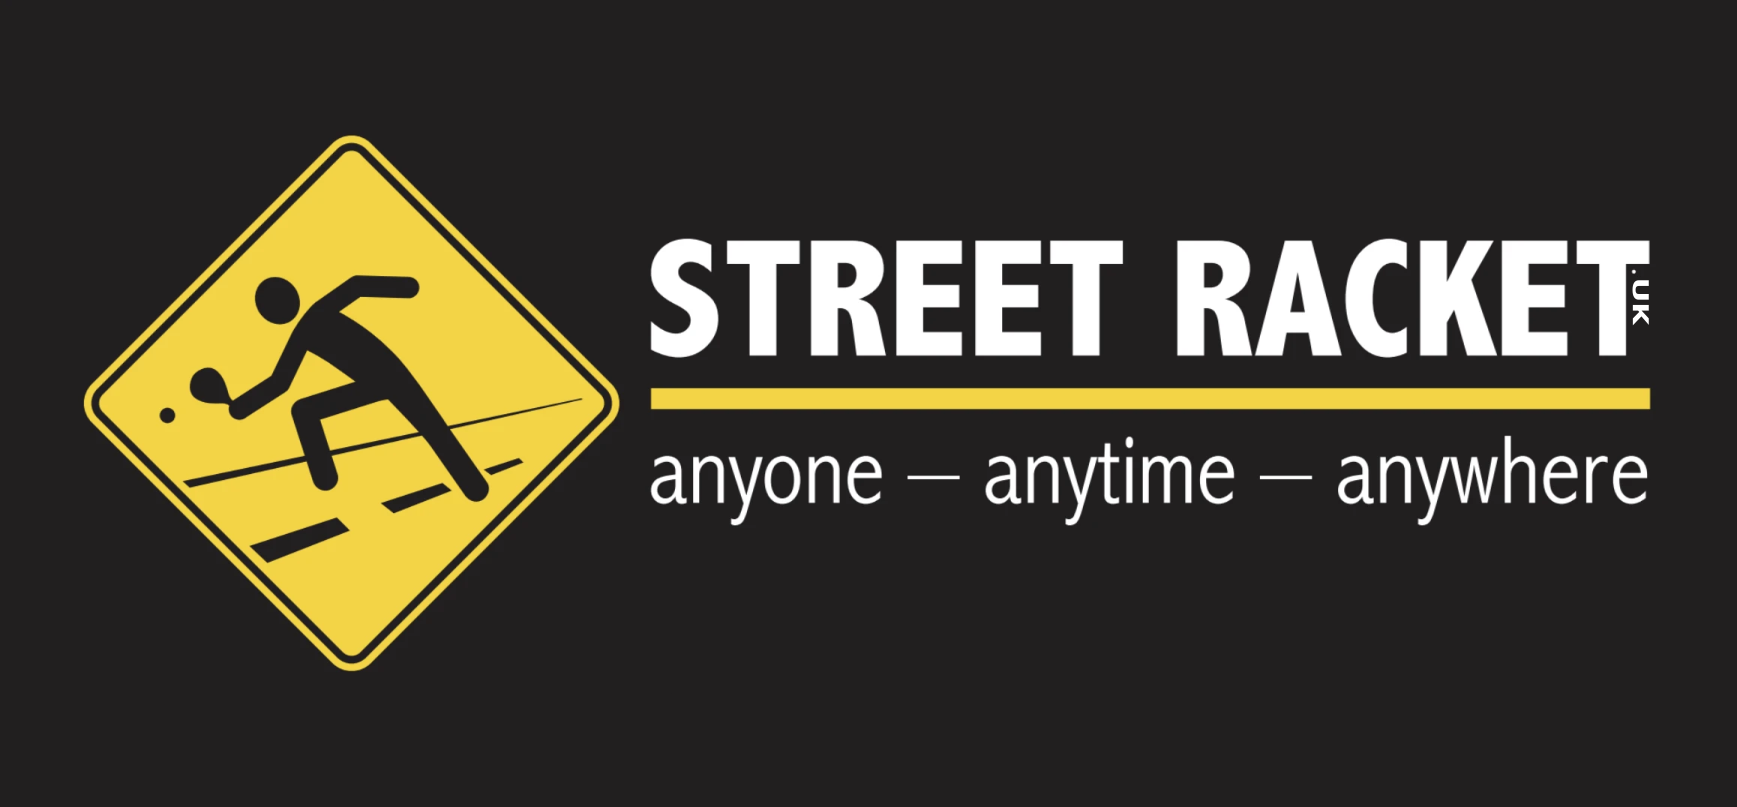 Street Racket logo